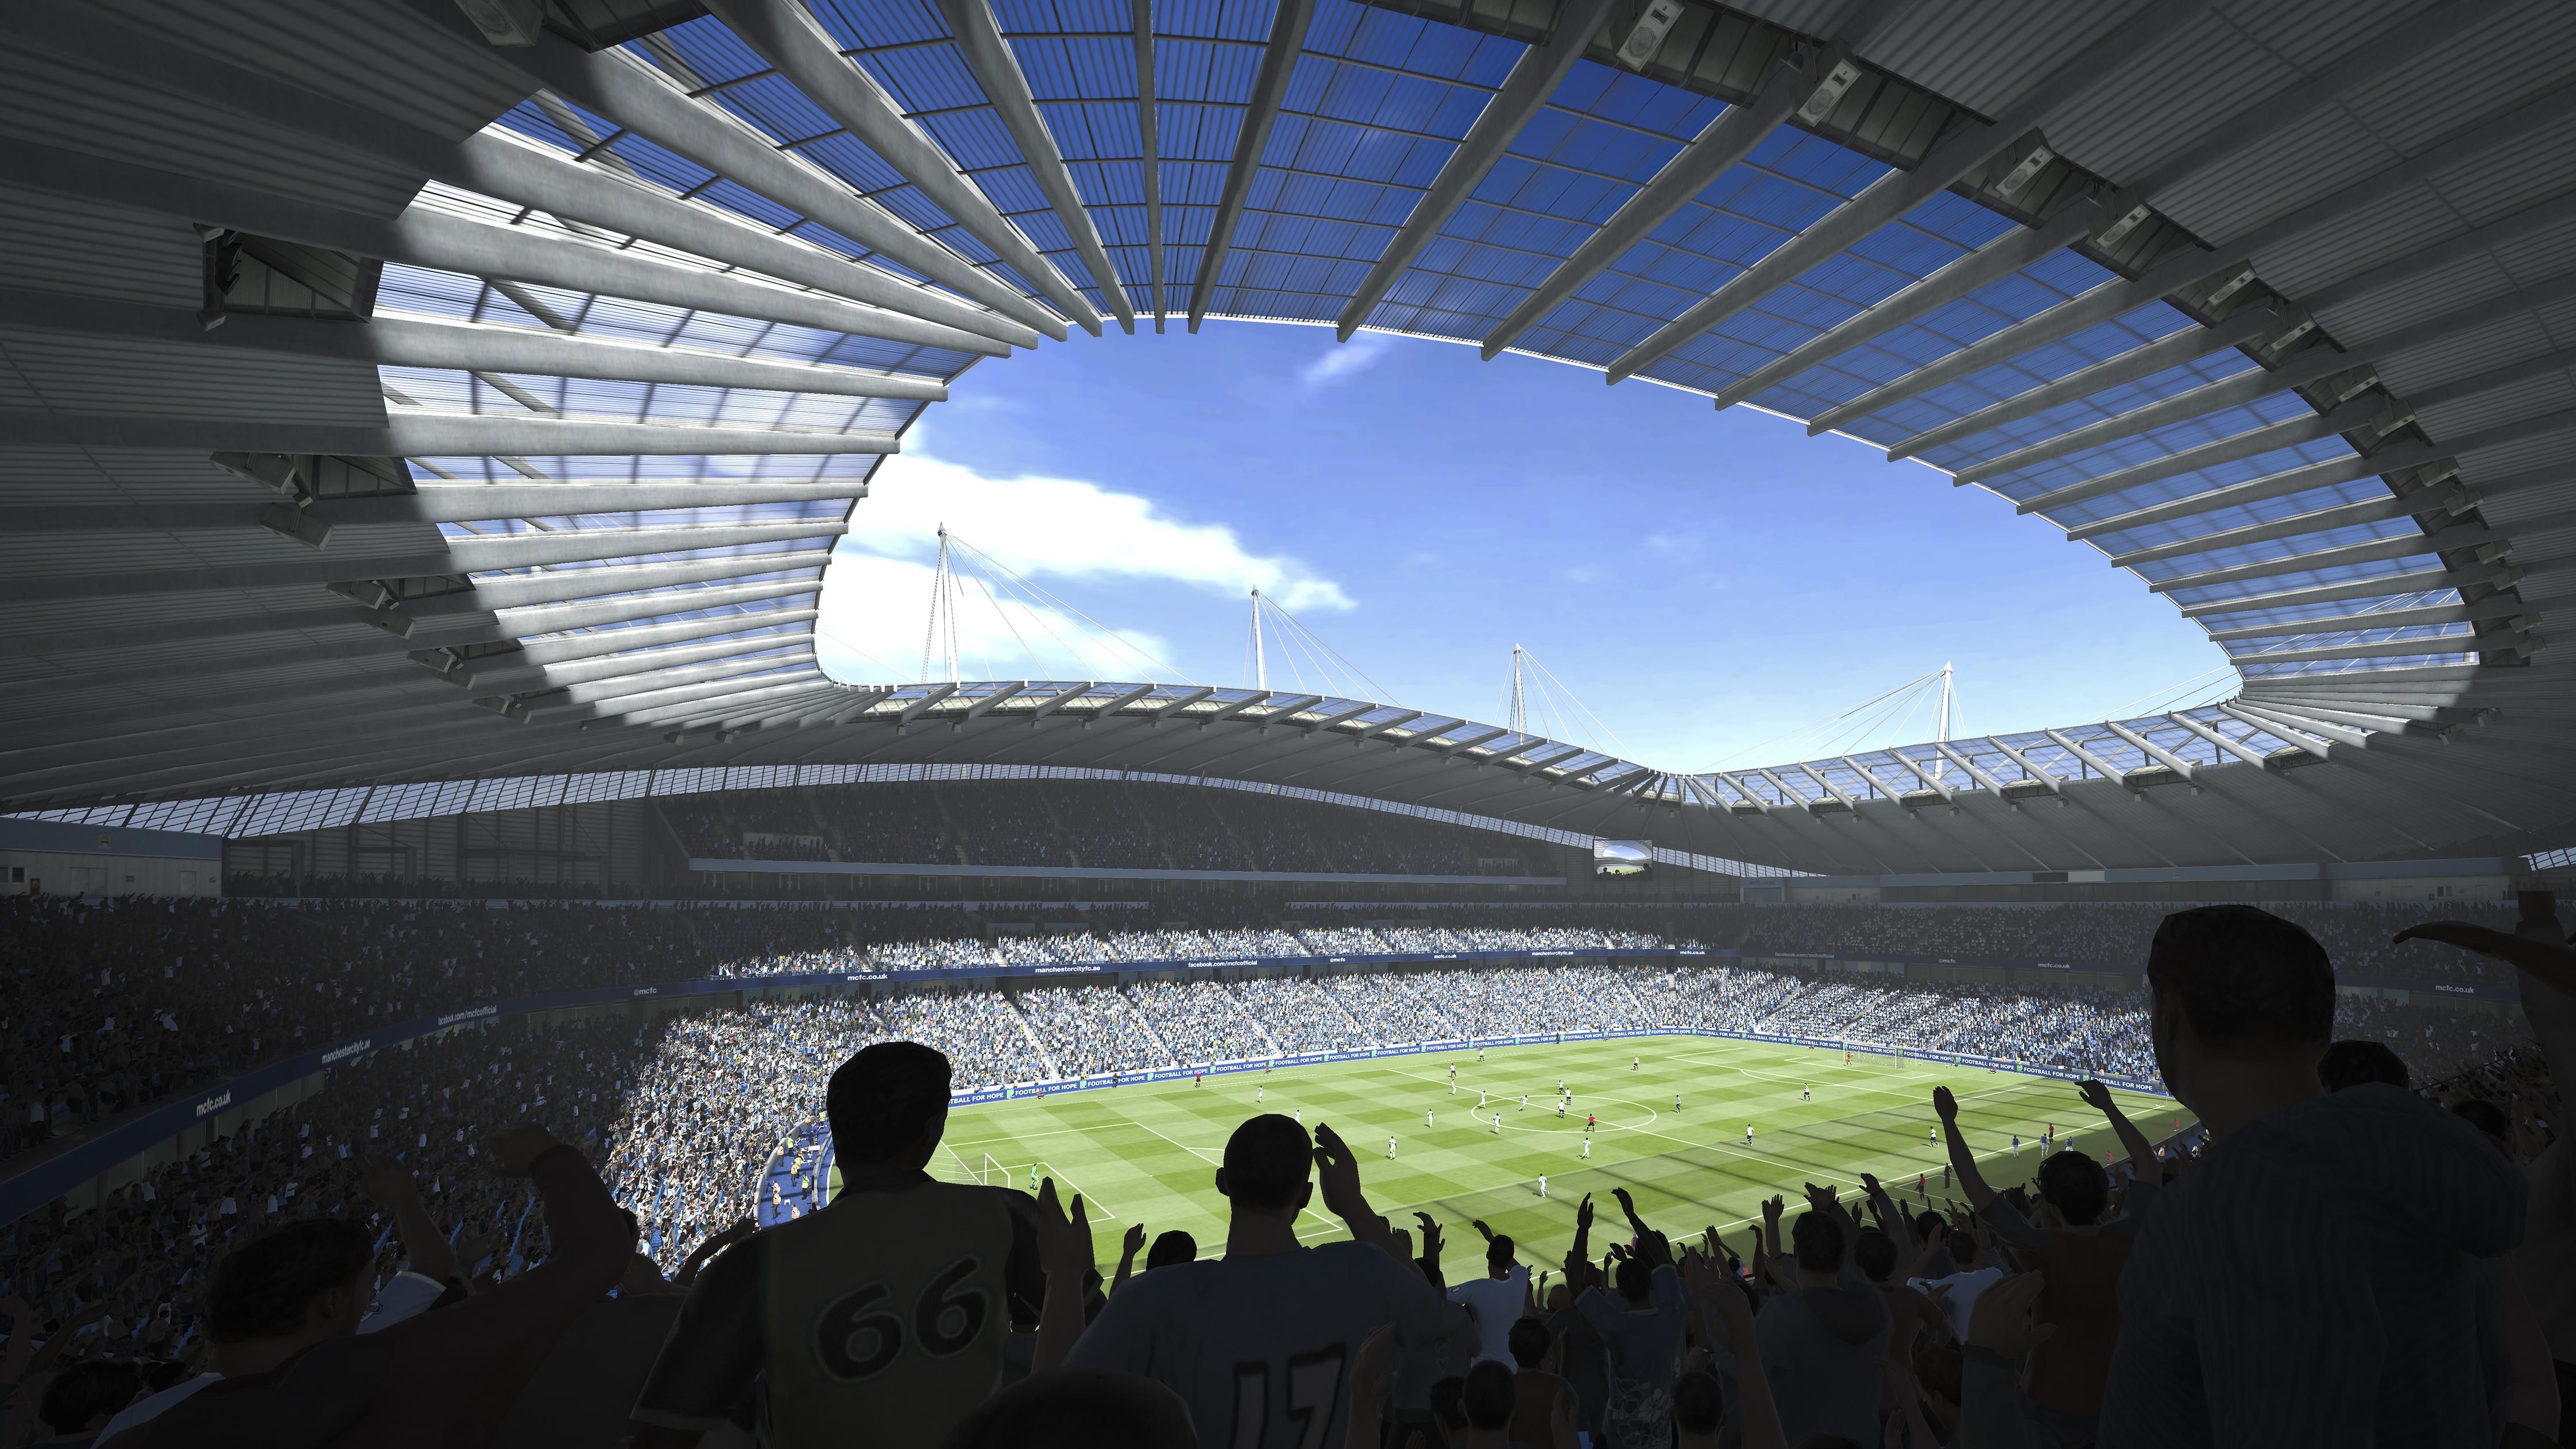 Etihad Stadium Fifa 14 606221 Hd Wallpaper